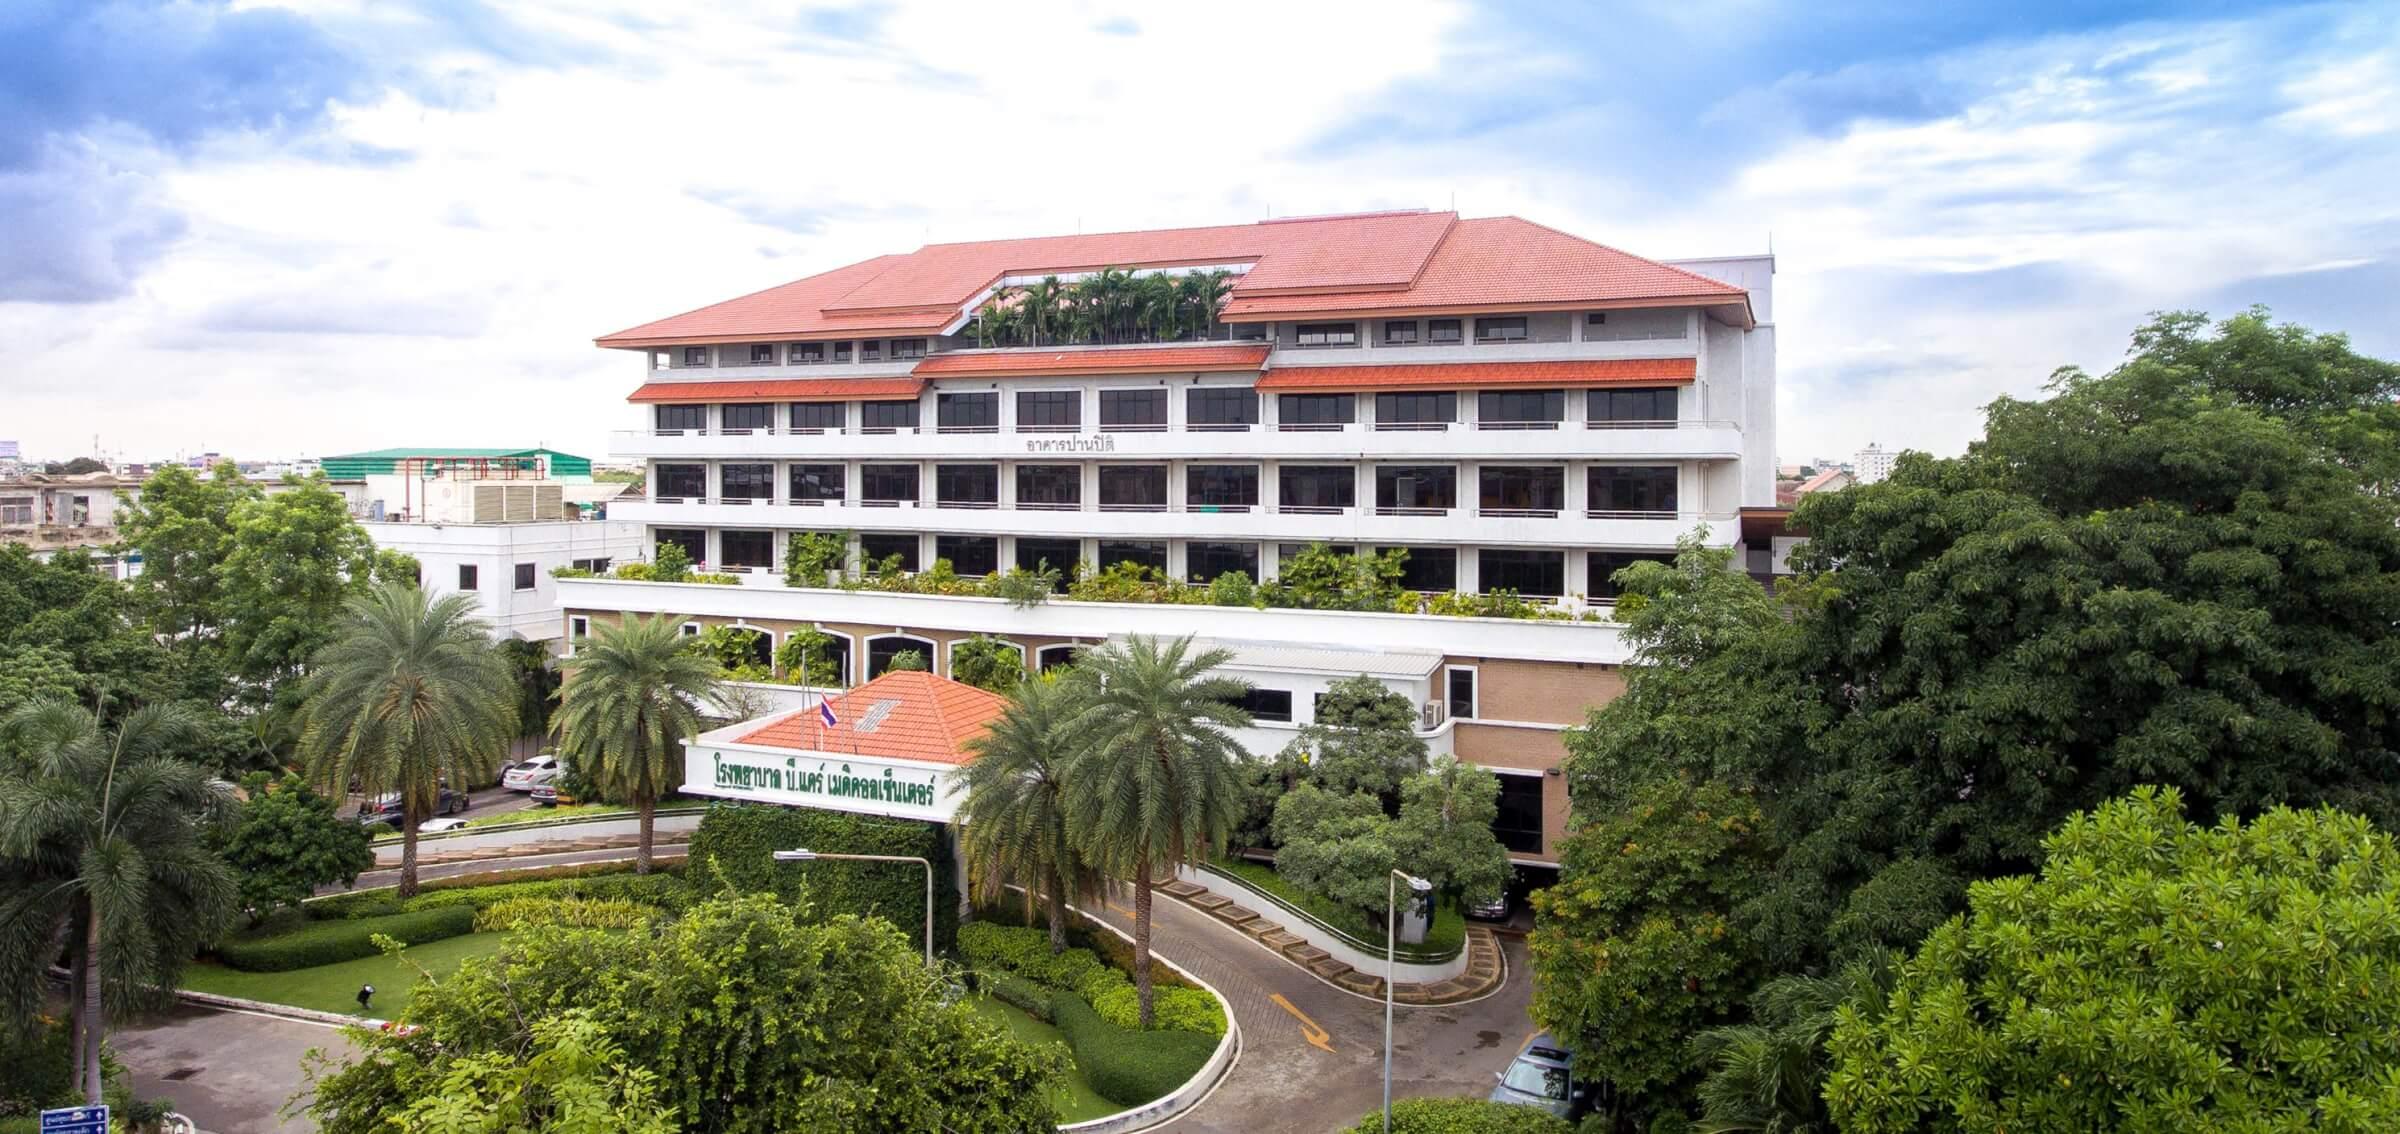 B.Care Medical Center มอบสิทธิประโยชน์แก่สมาชิก AssetWise Club